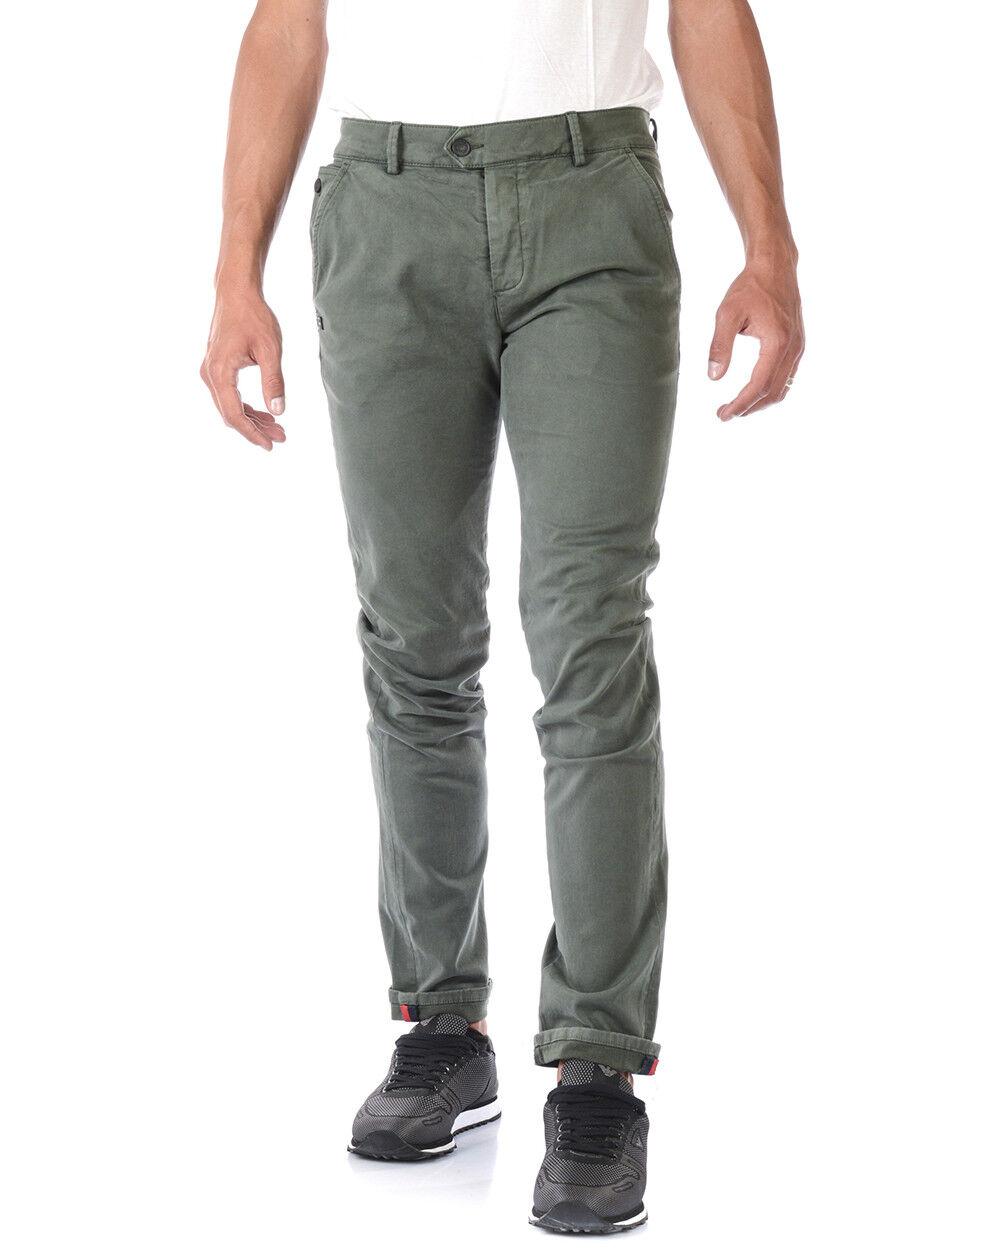 Jeans Daniele Alessandrini Jeans Cotone men green PJ5662L1003735 33